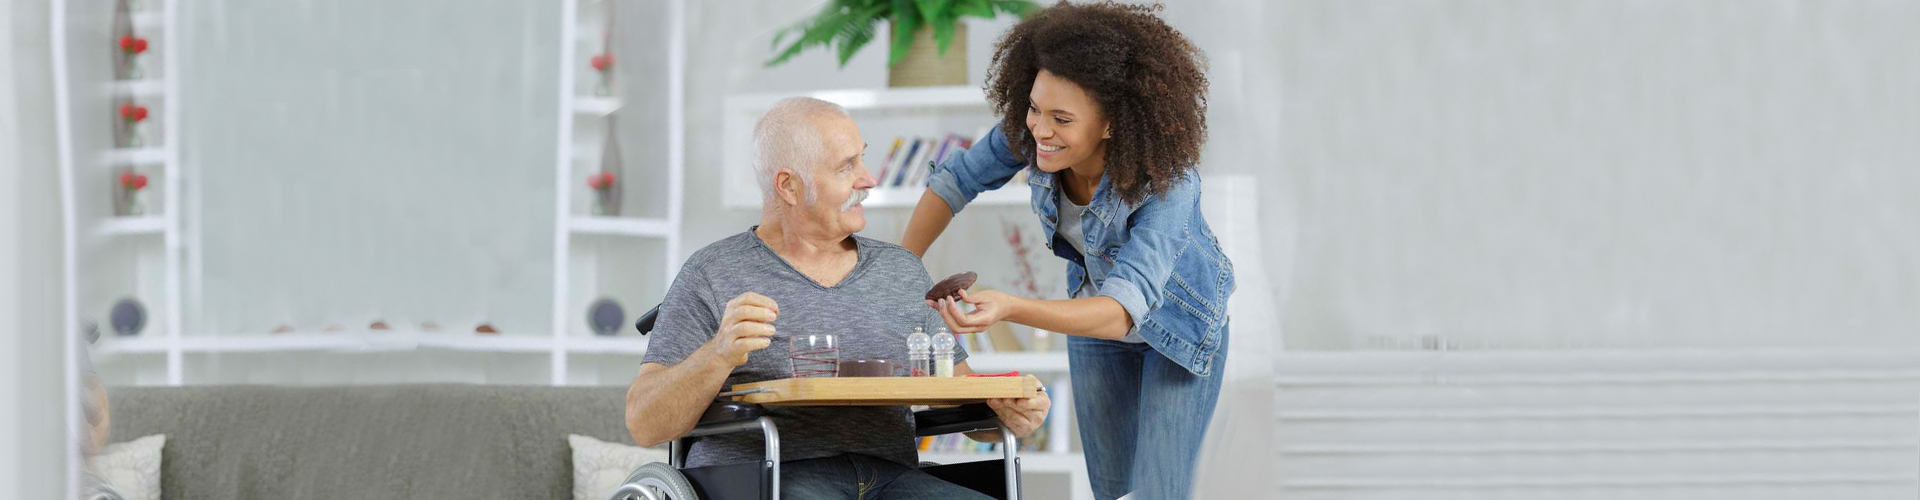 a caregiver giving medicine to the senior man